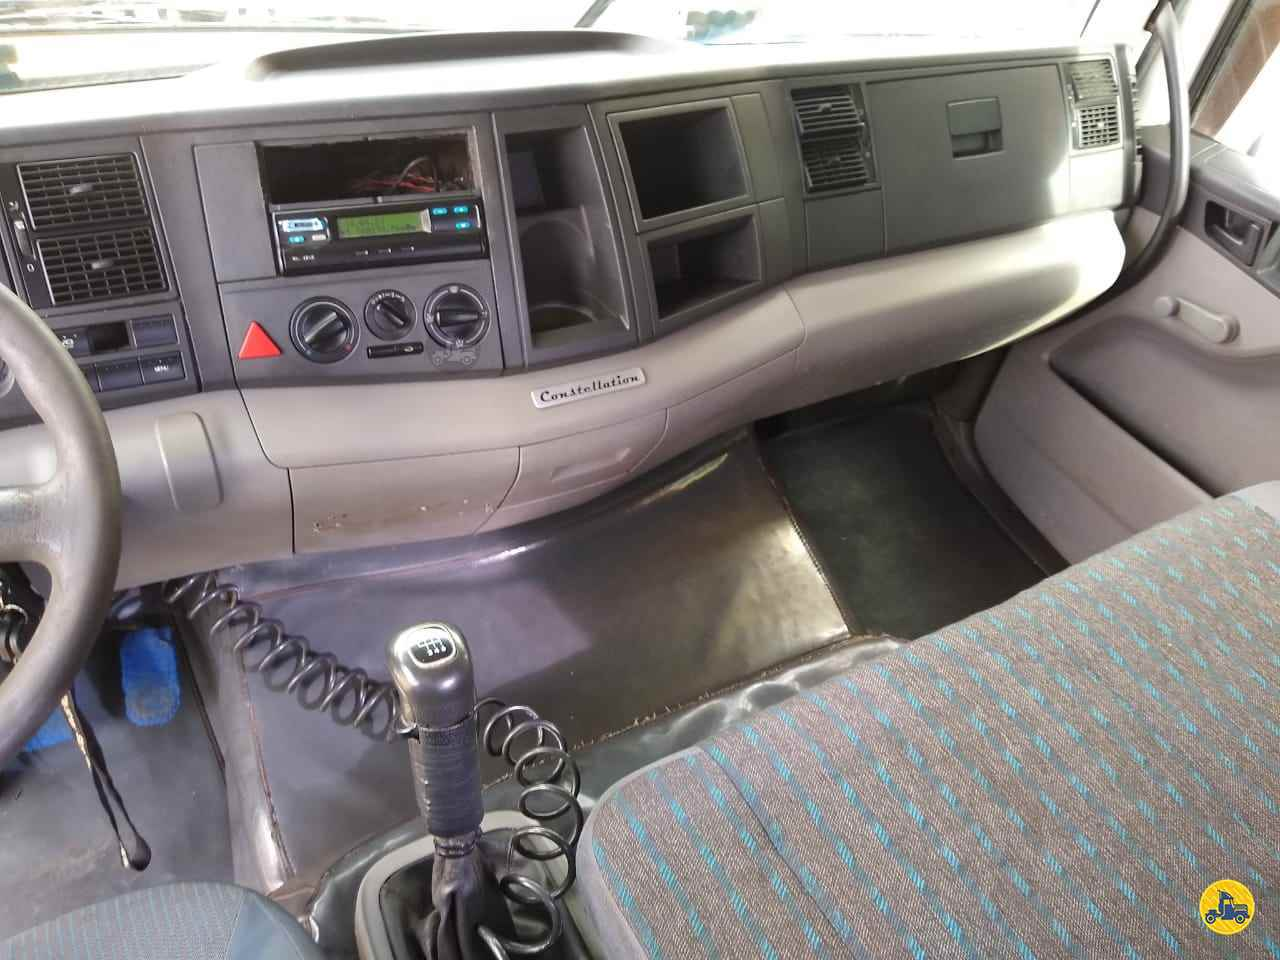 VOLKSWAGEN VW 24250 780000km 2007/2007 DKM Caminhões